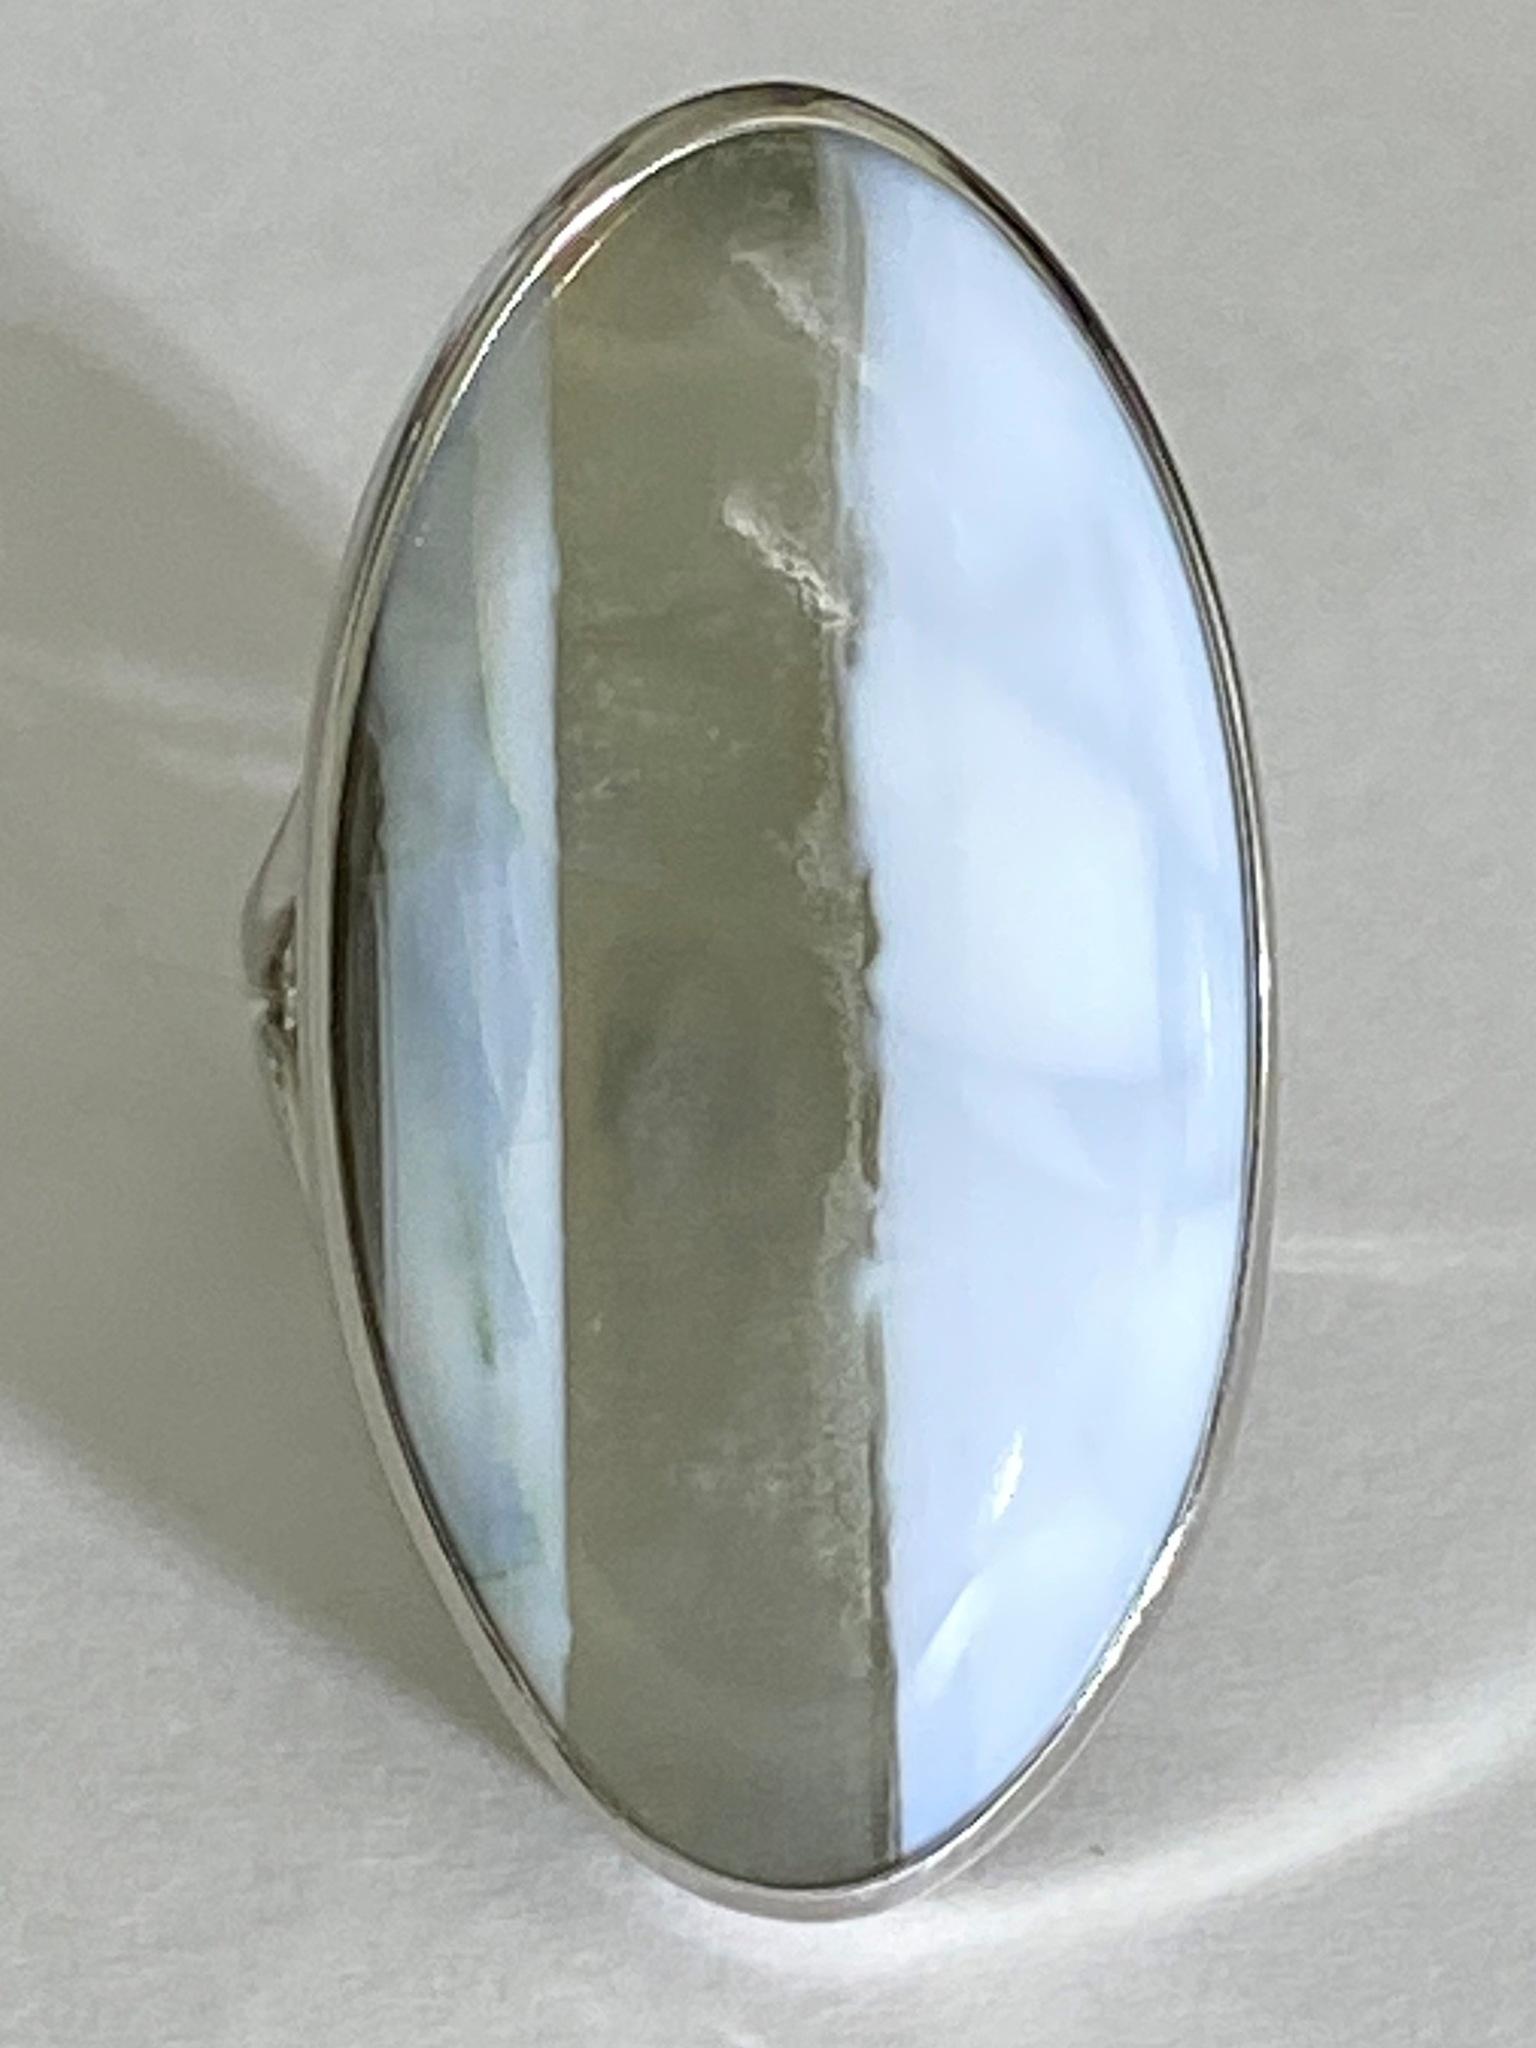 Опал овал (кольцо из серебра)